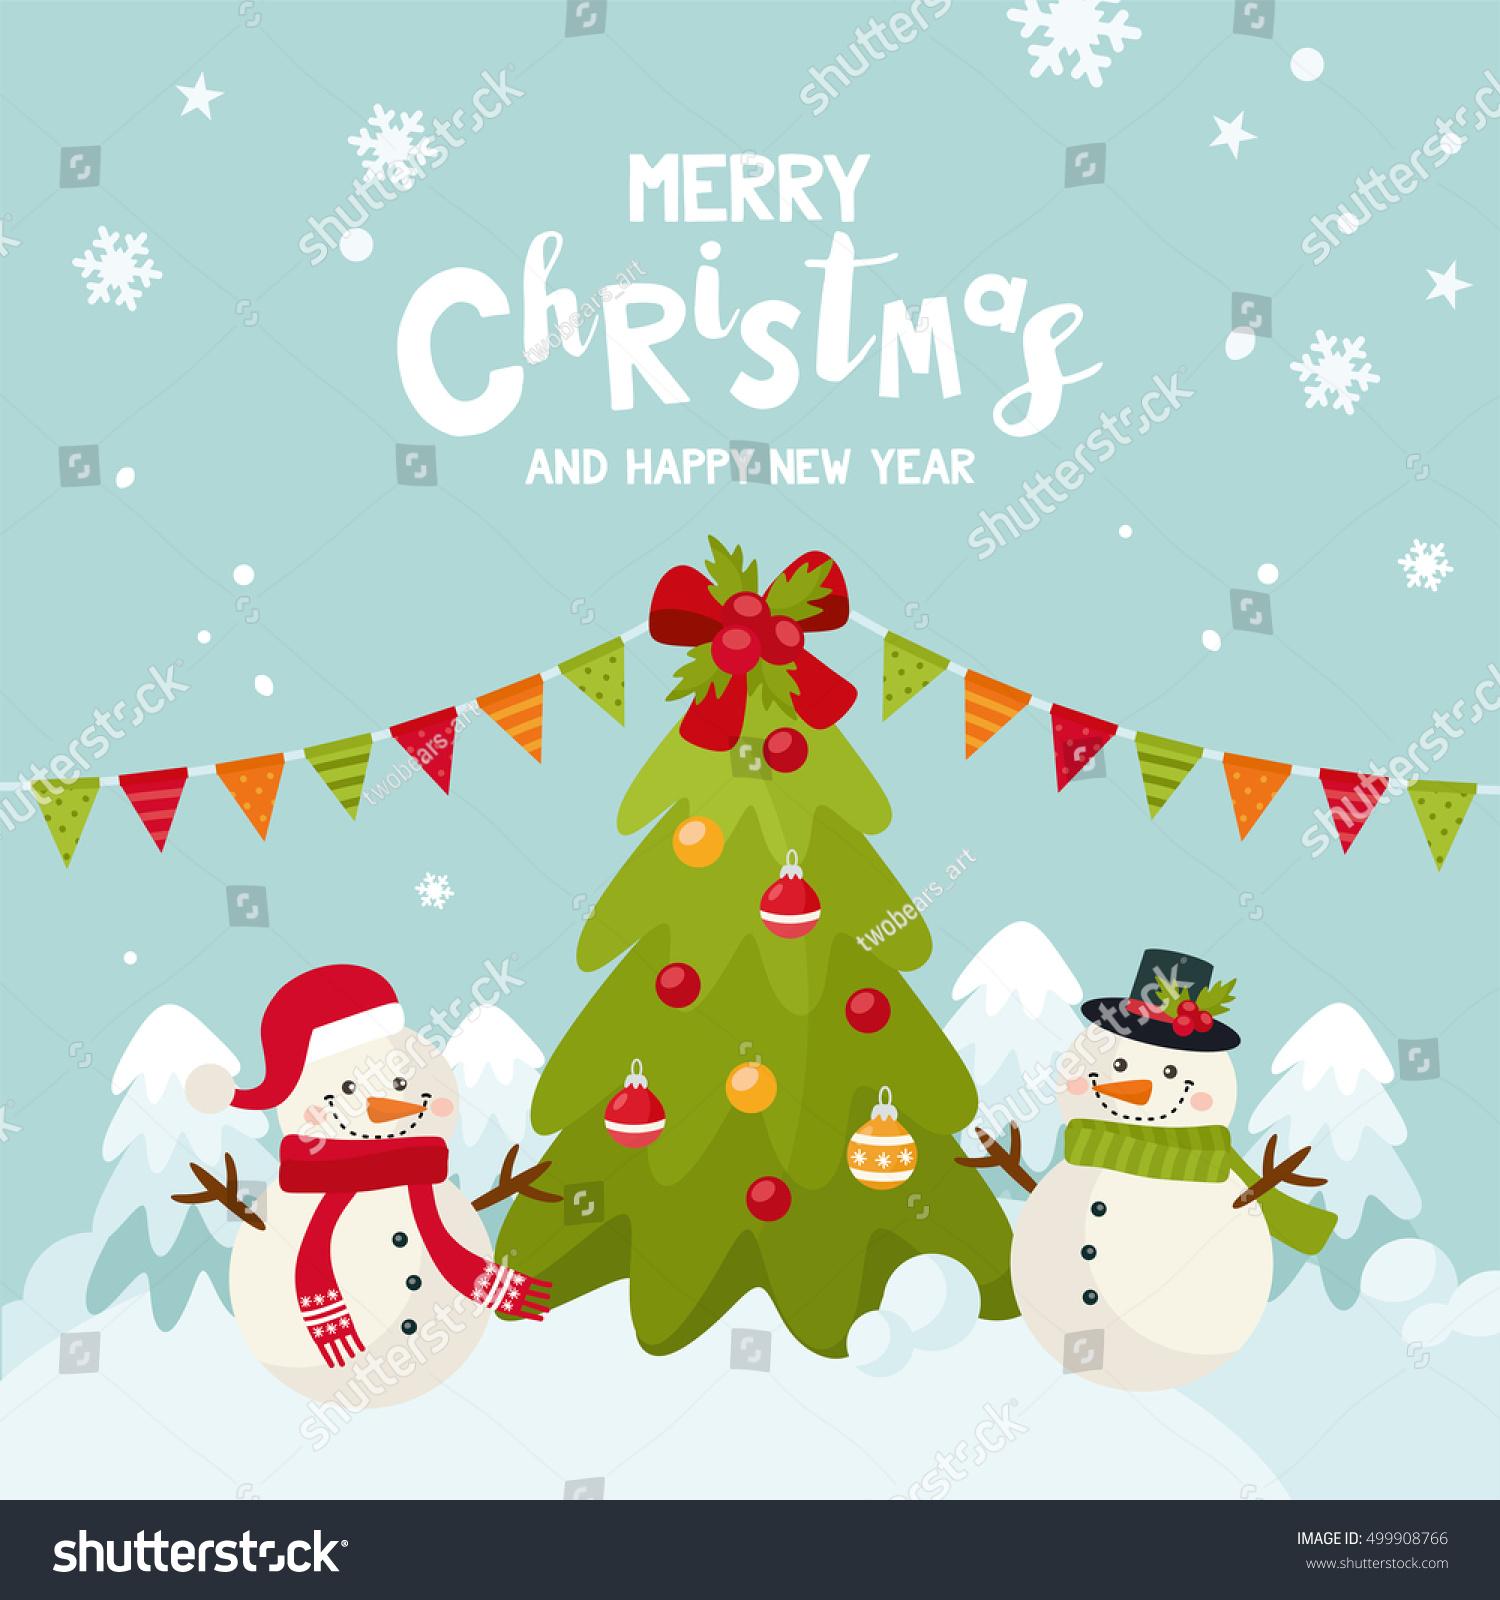 Merry Christmas Greeting Card Cute Snowman Stock Vector (Royalty ...